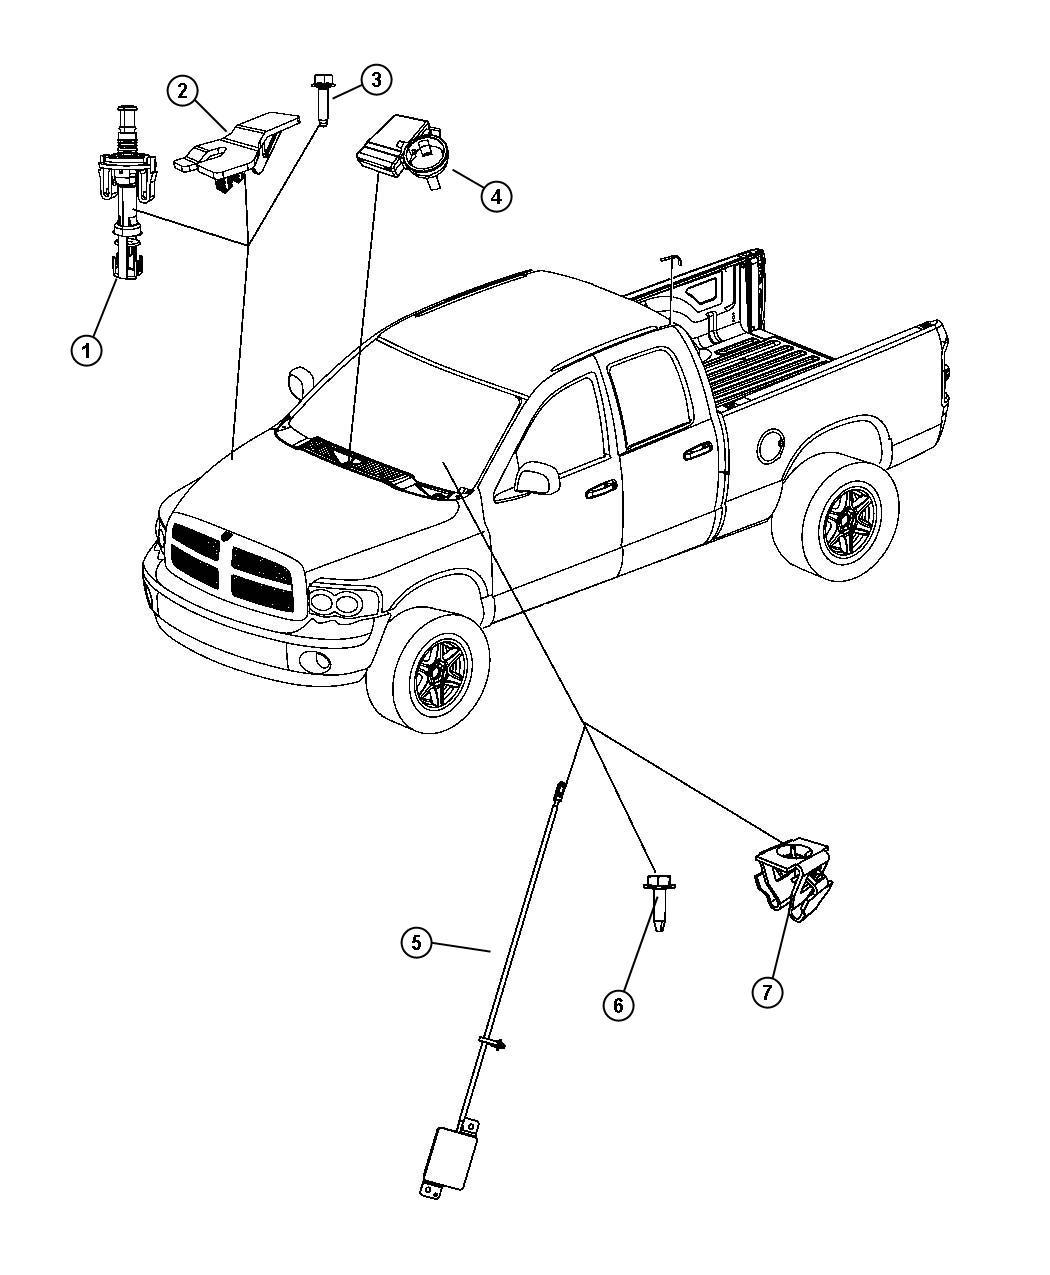 2007 Dodge Ram 1500 Antenna. Keyless entry. Remote start